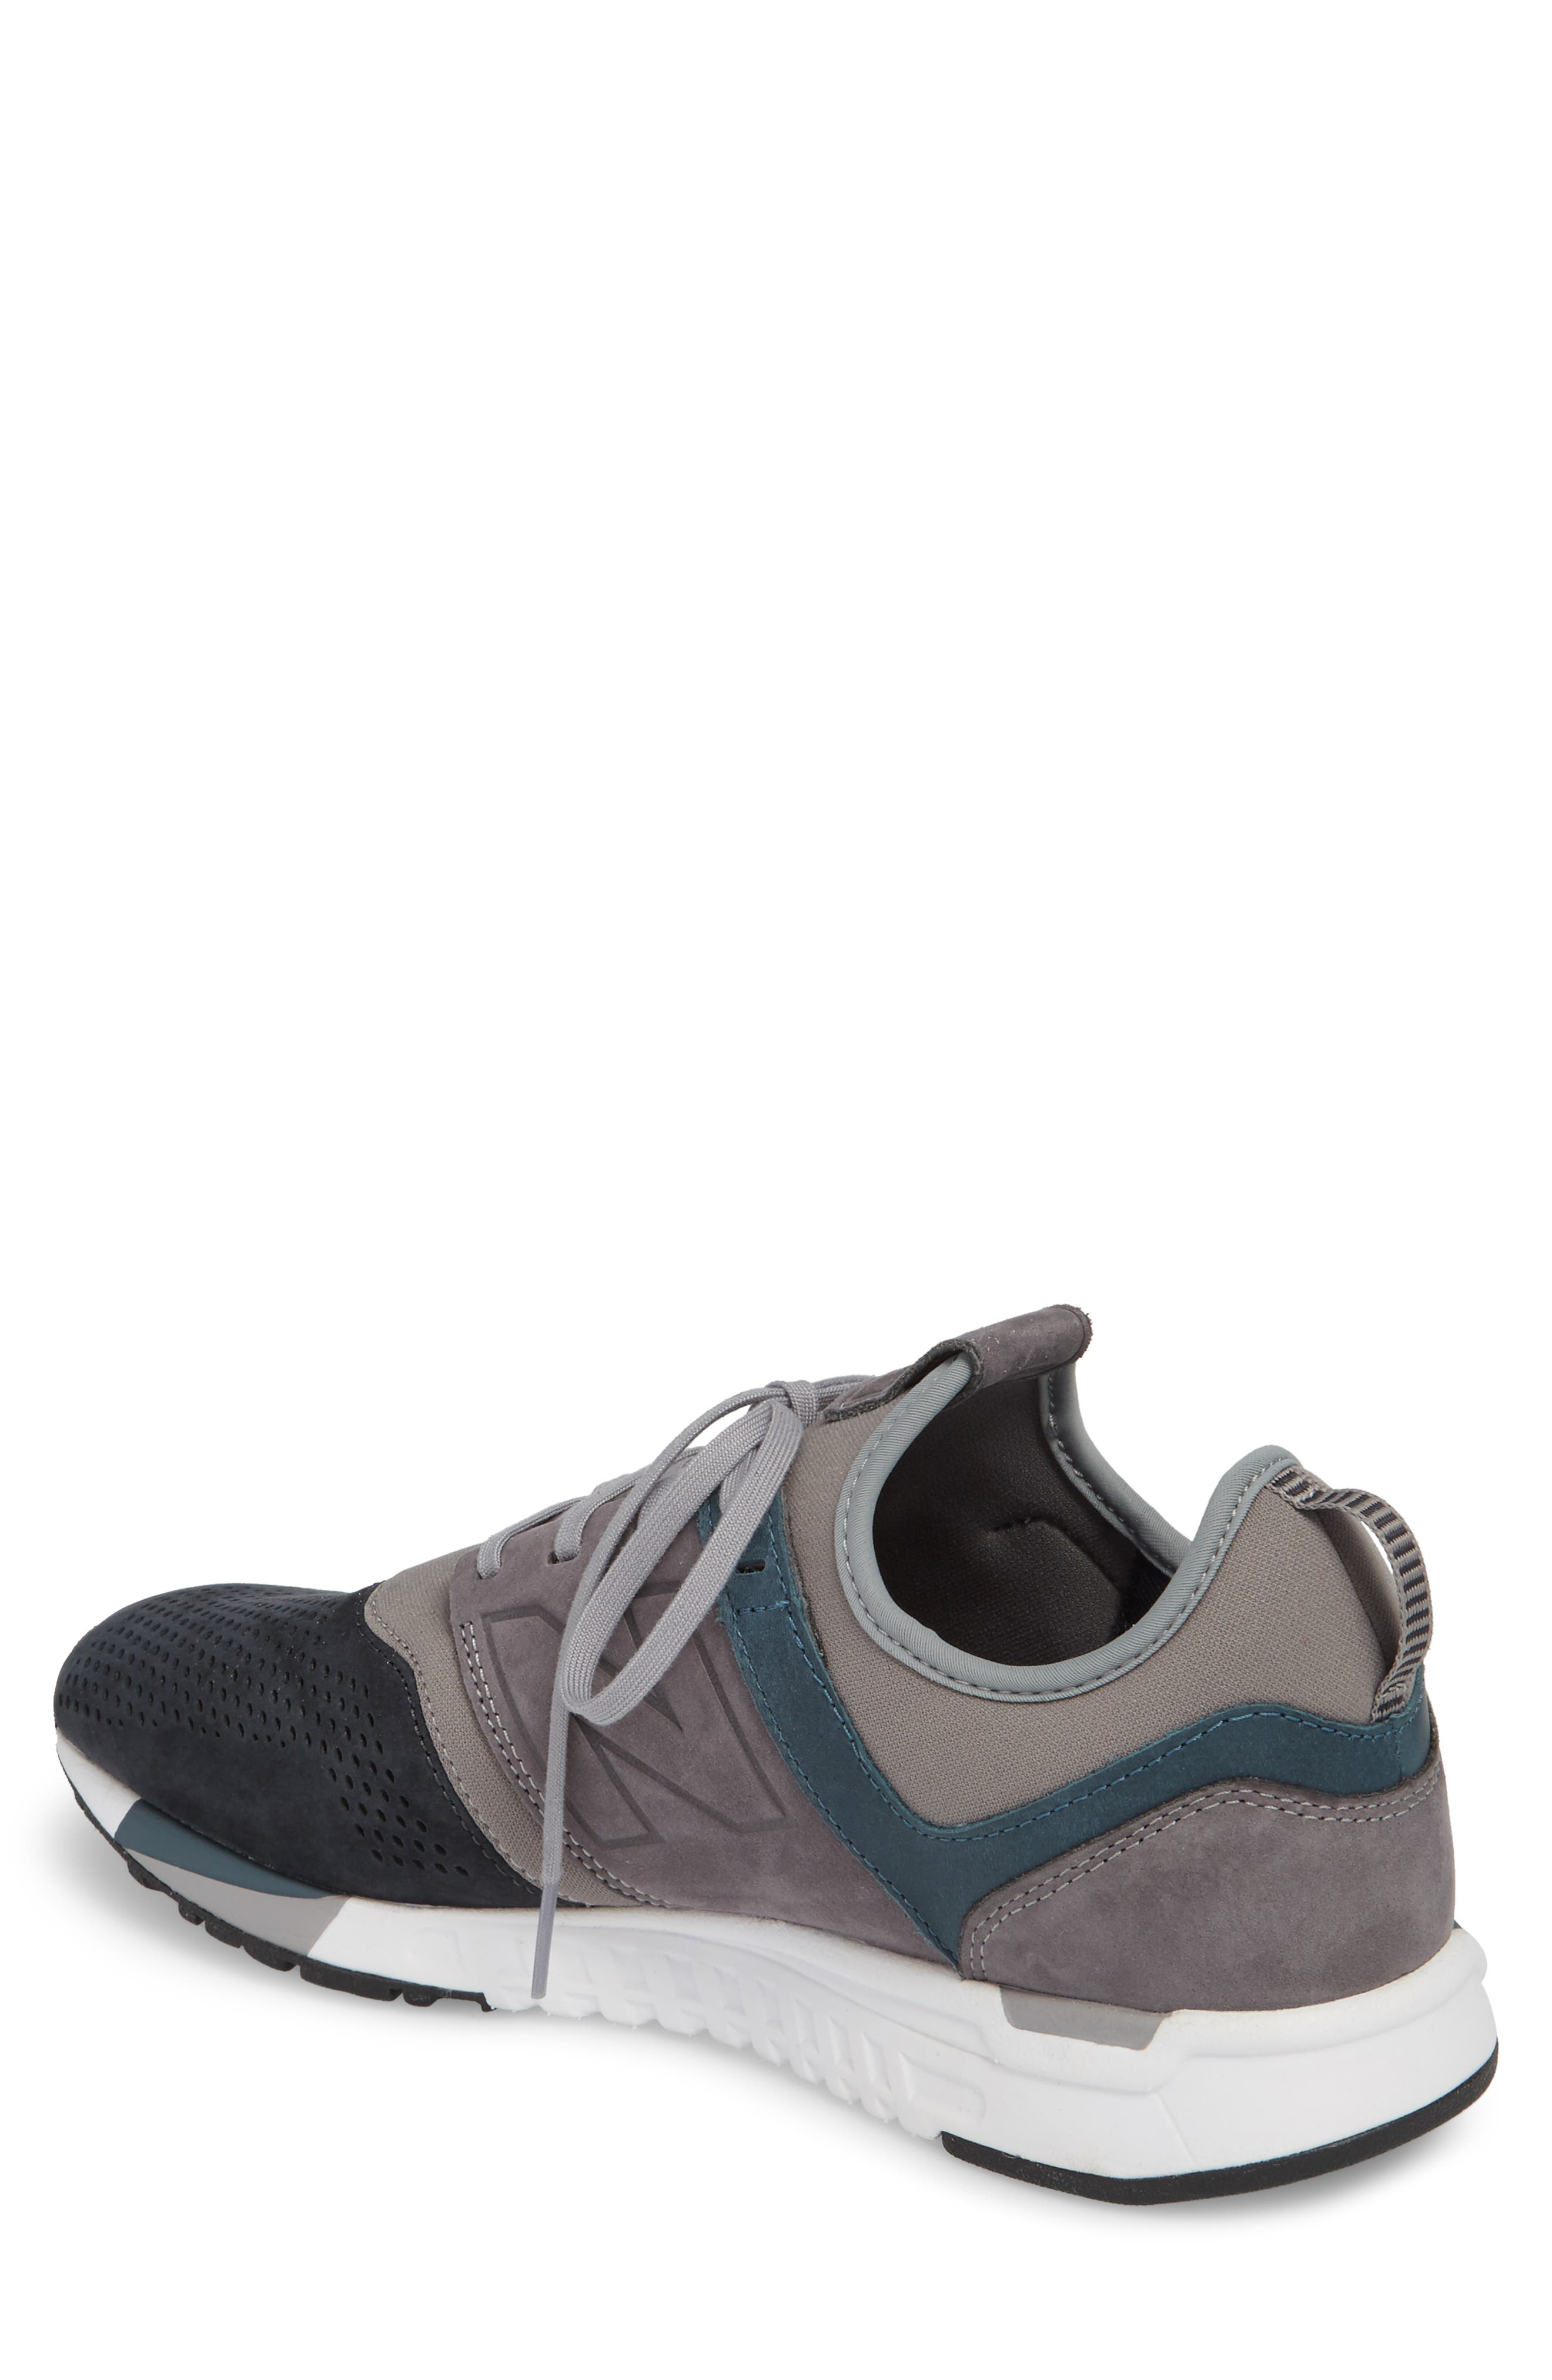 Alternate Image 2  - New Balance 274 Luxe Sneaker (Men)